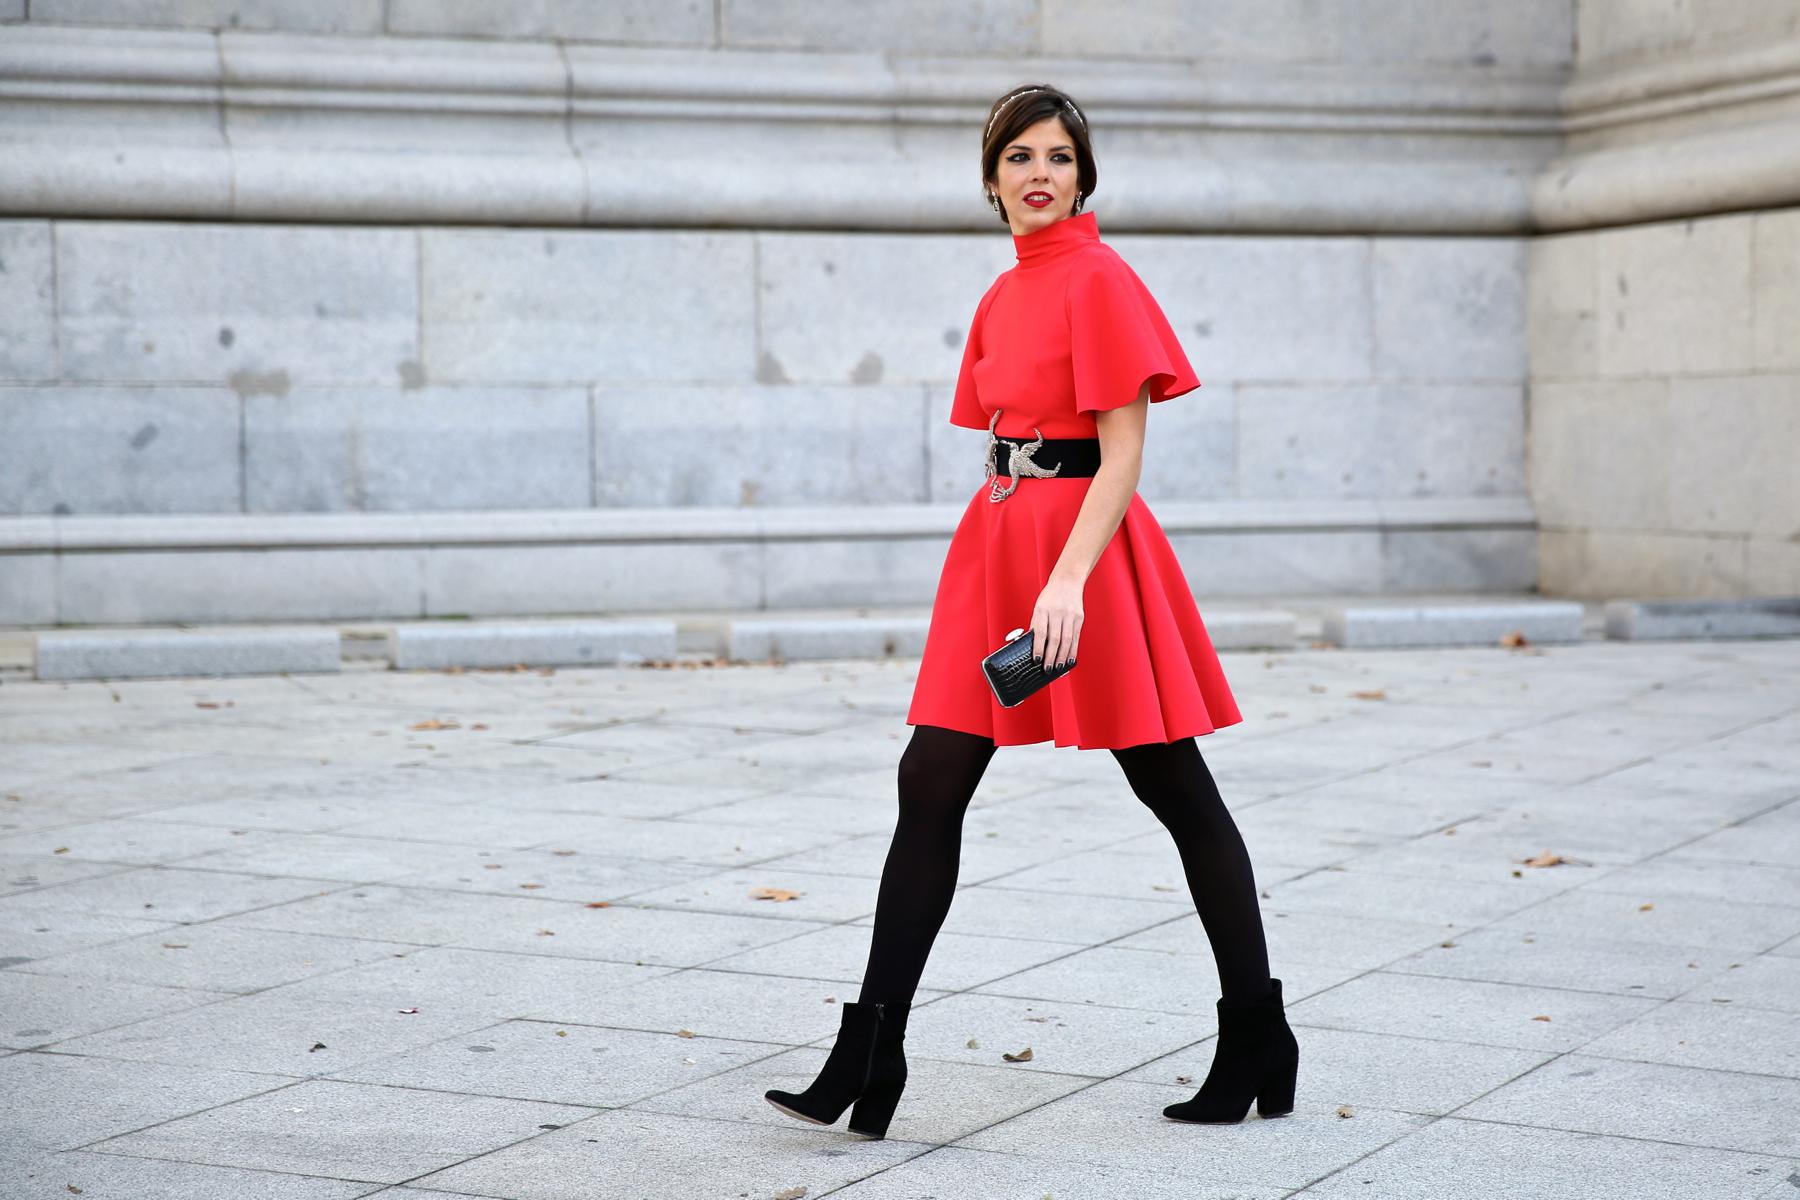 trendy_taste-look-outfit-street_style-ootd-blog-blogger-fashion_spain-moda_españa-vestido_fiesta-24fab-7